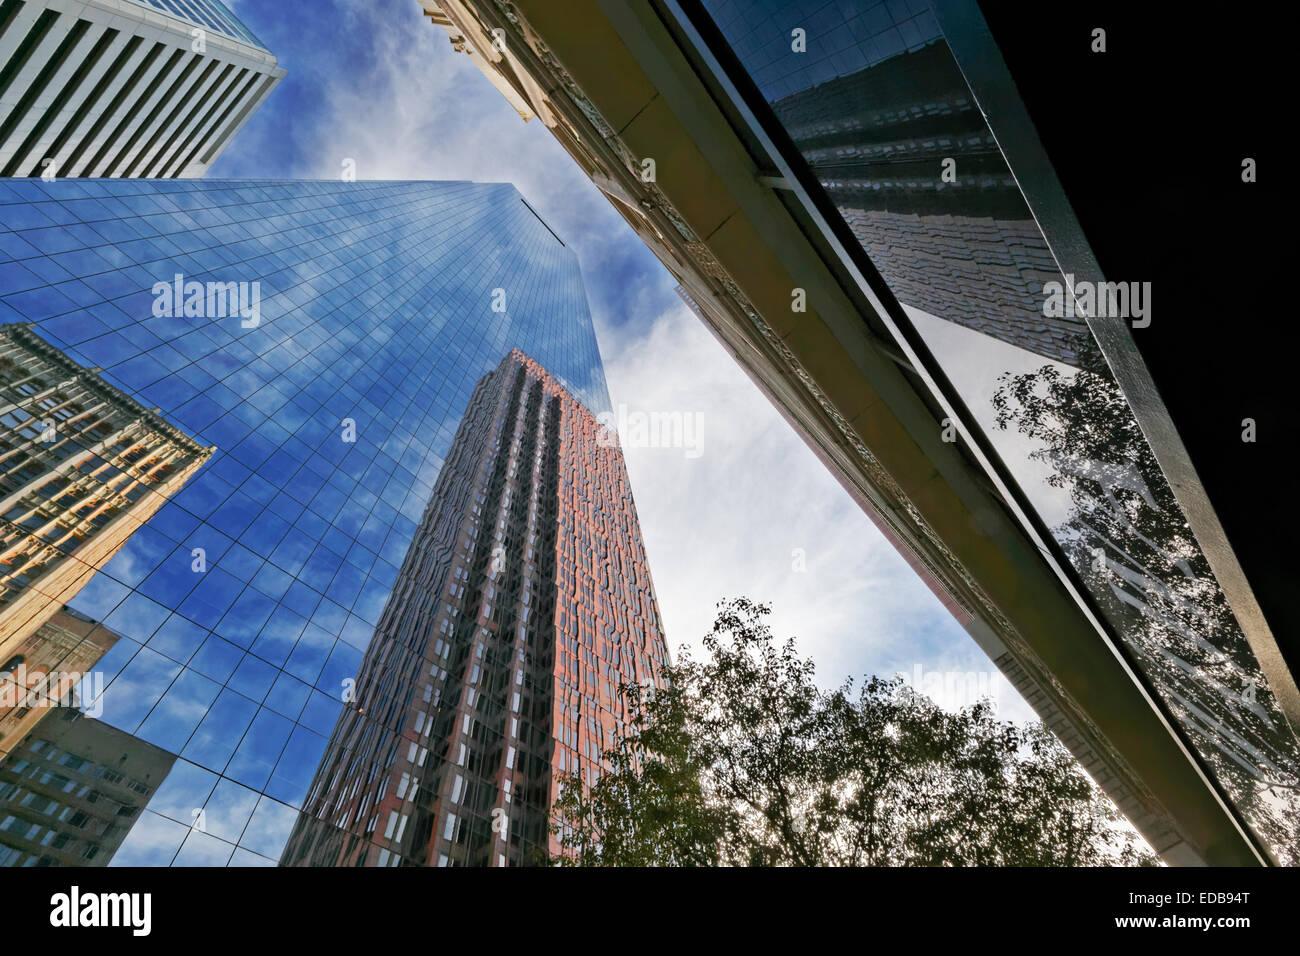 Office Building Reflections, Philadelphia, Pennsylvania - Stock Image